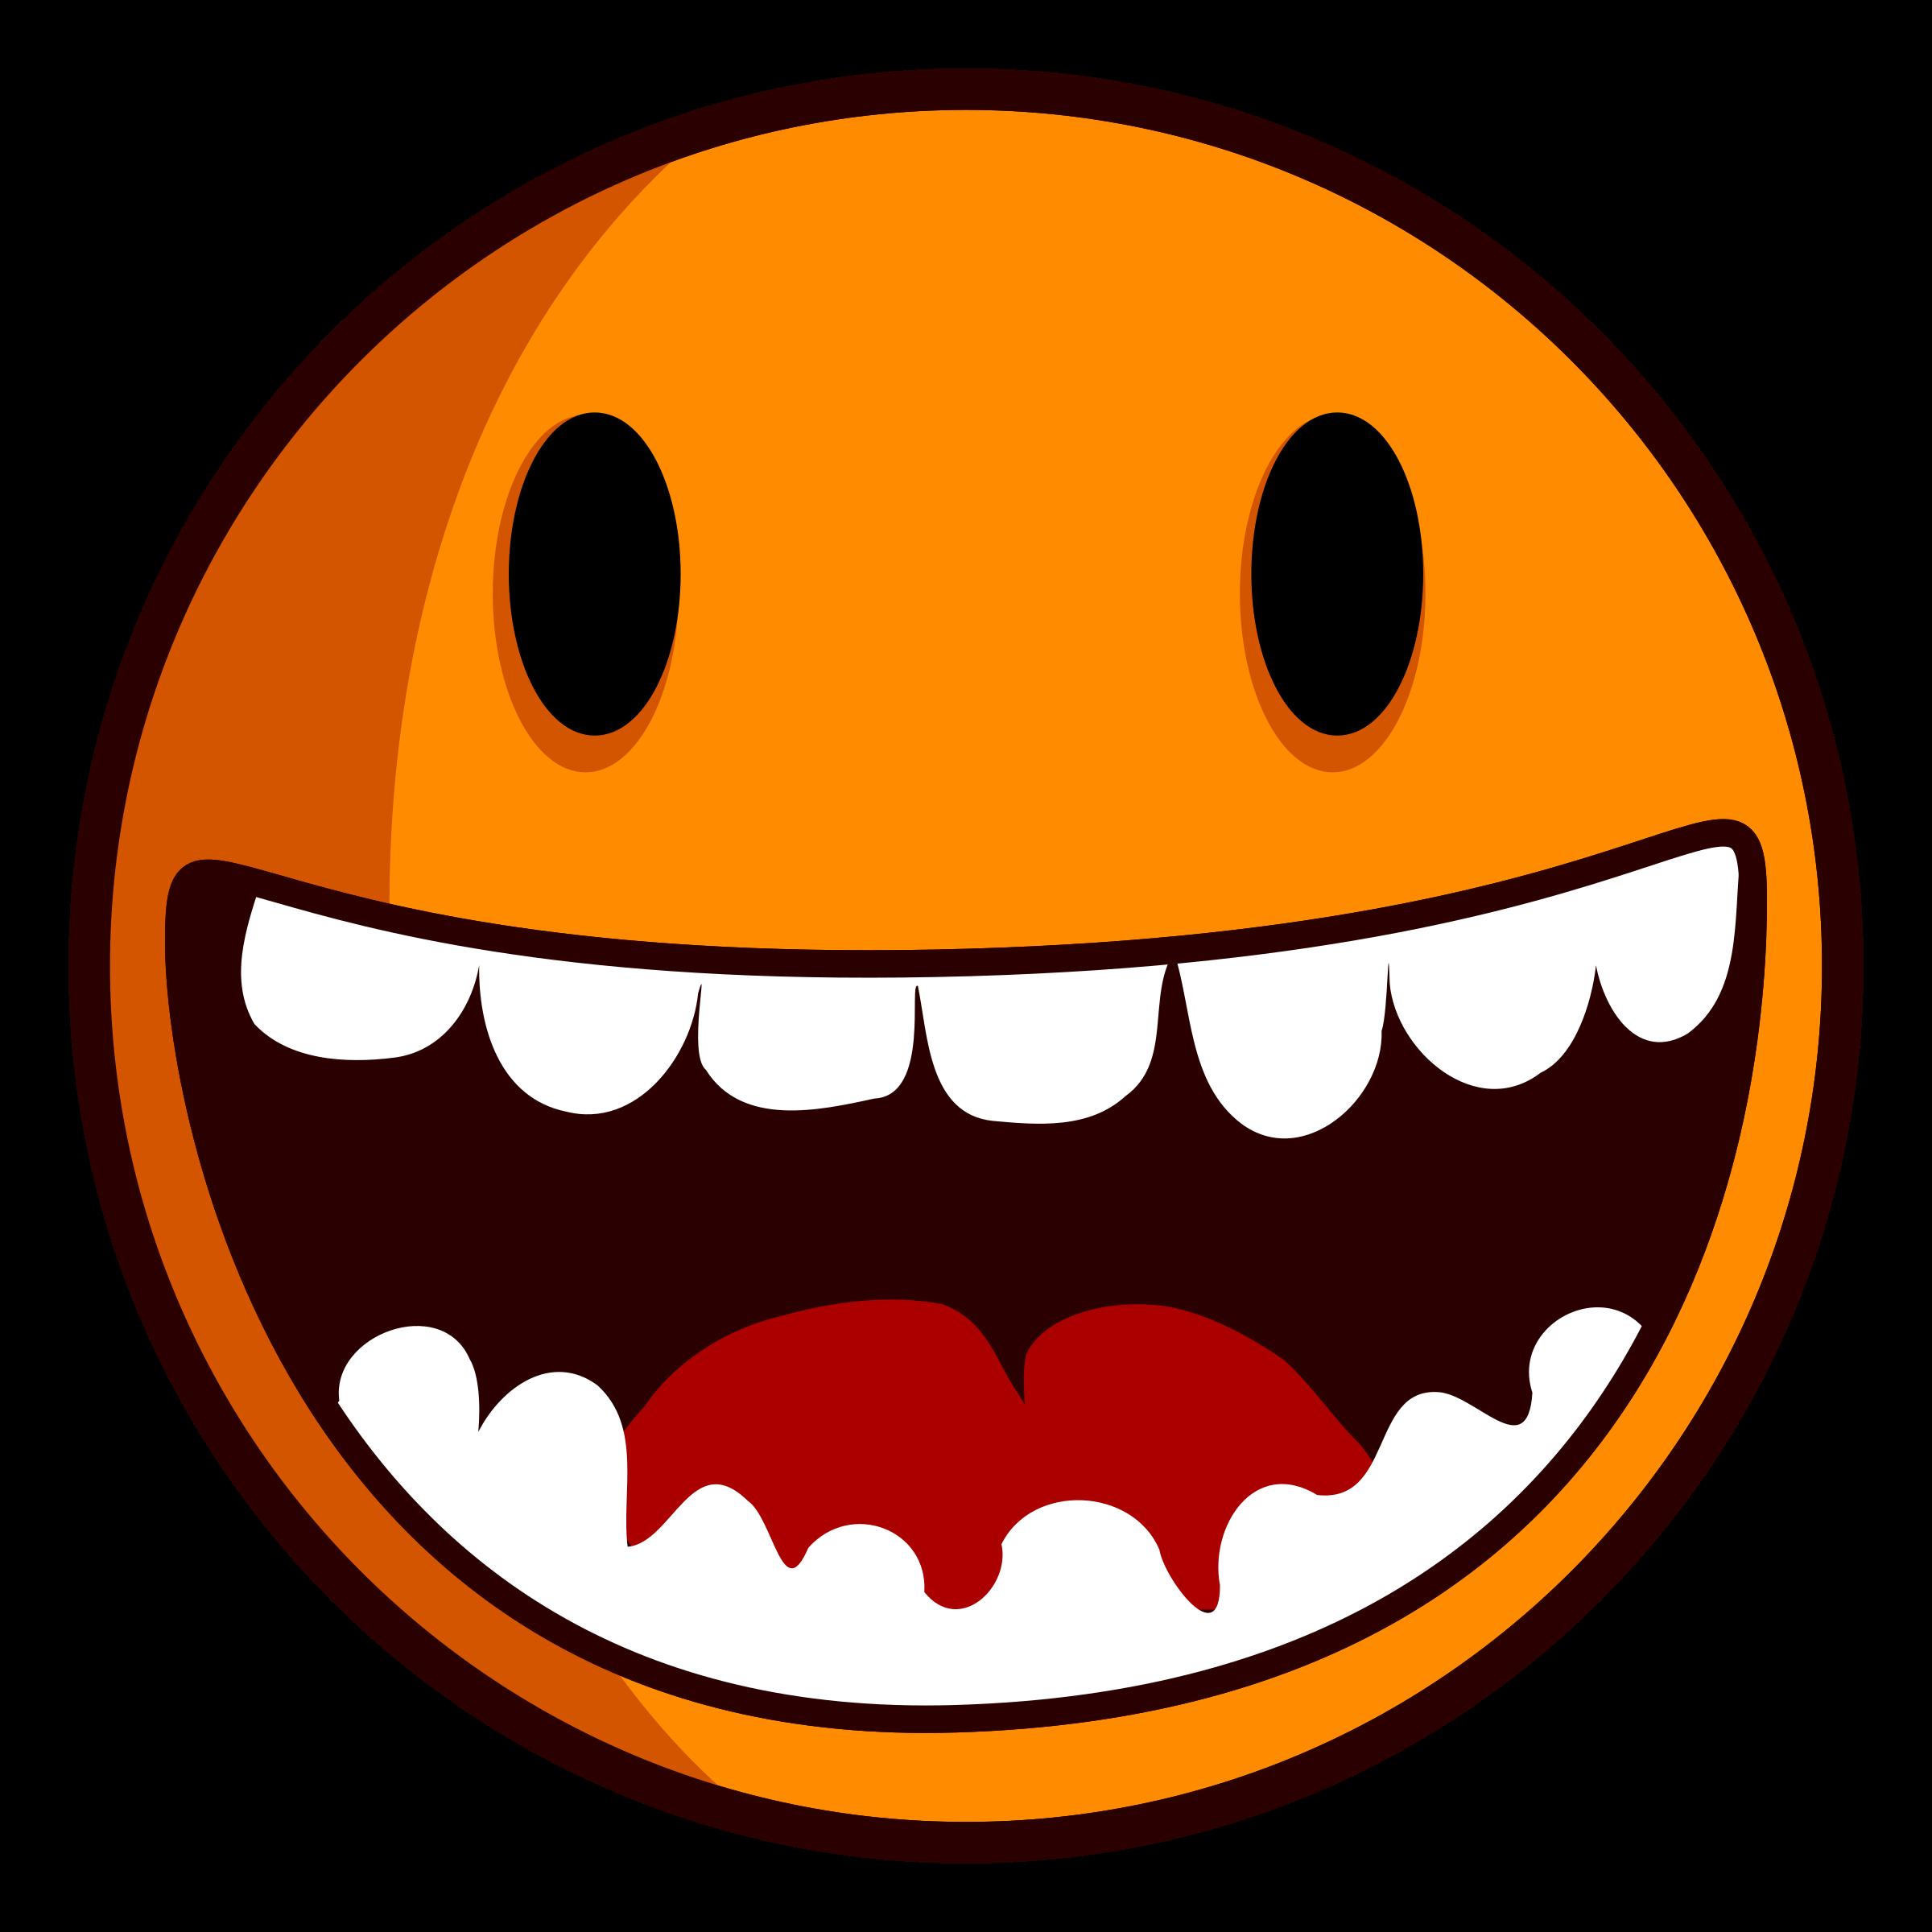 Funny Faces Clip Art - ClipArt Best